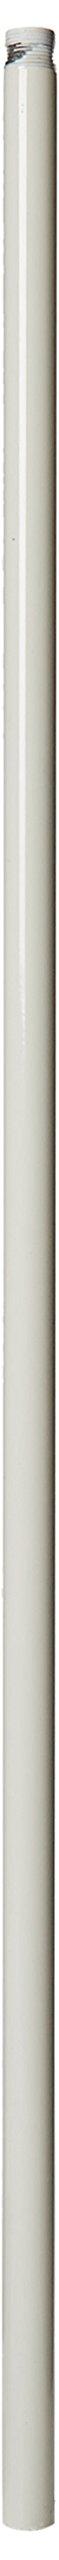 Hunter 25140 48-Inch Standard Standard Extension Downrod, White